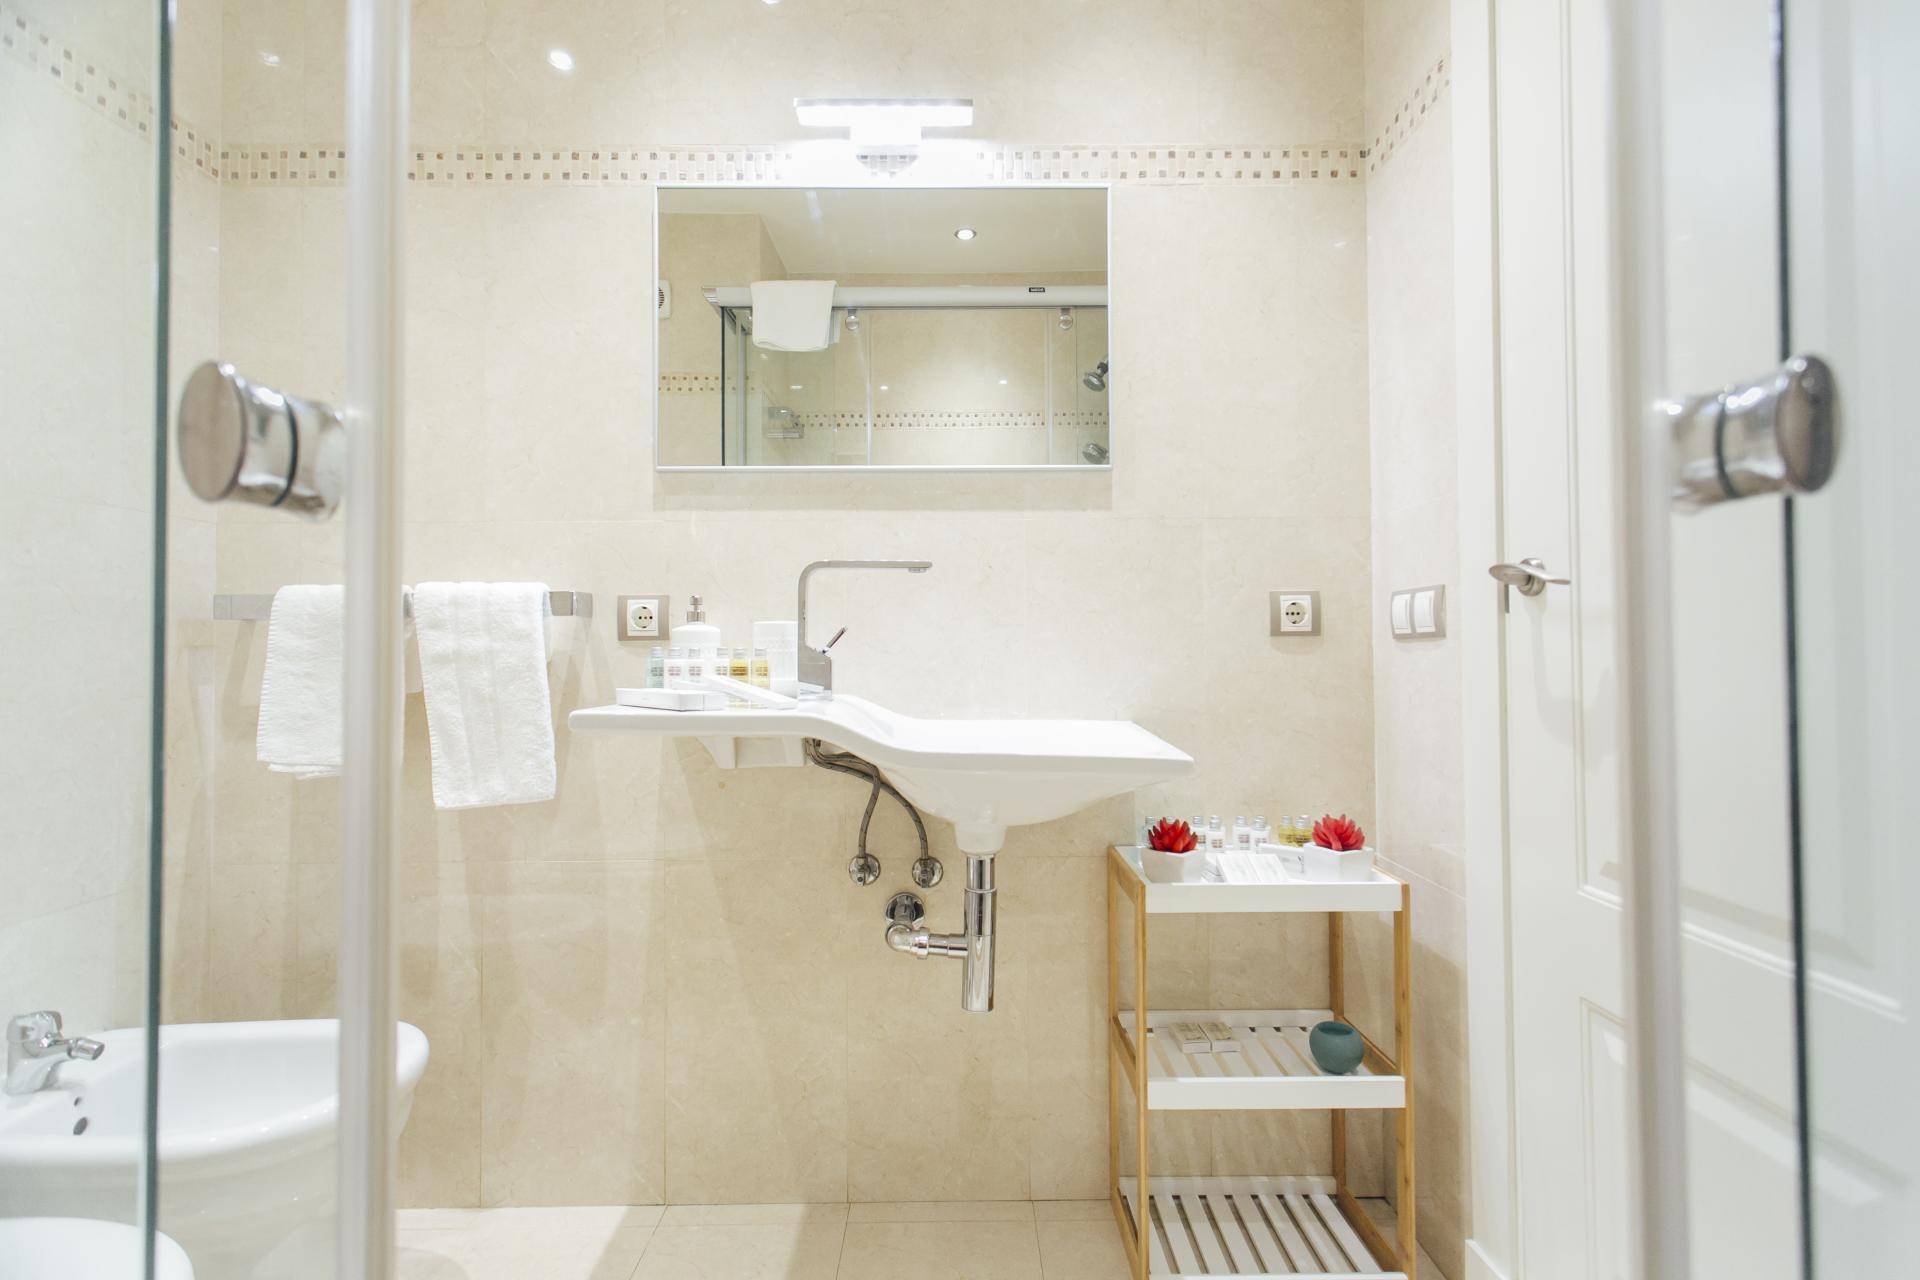 Bathroom at Arjona Apartment, Centre, Seville